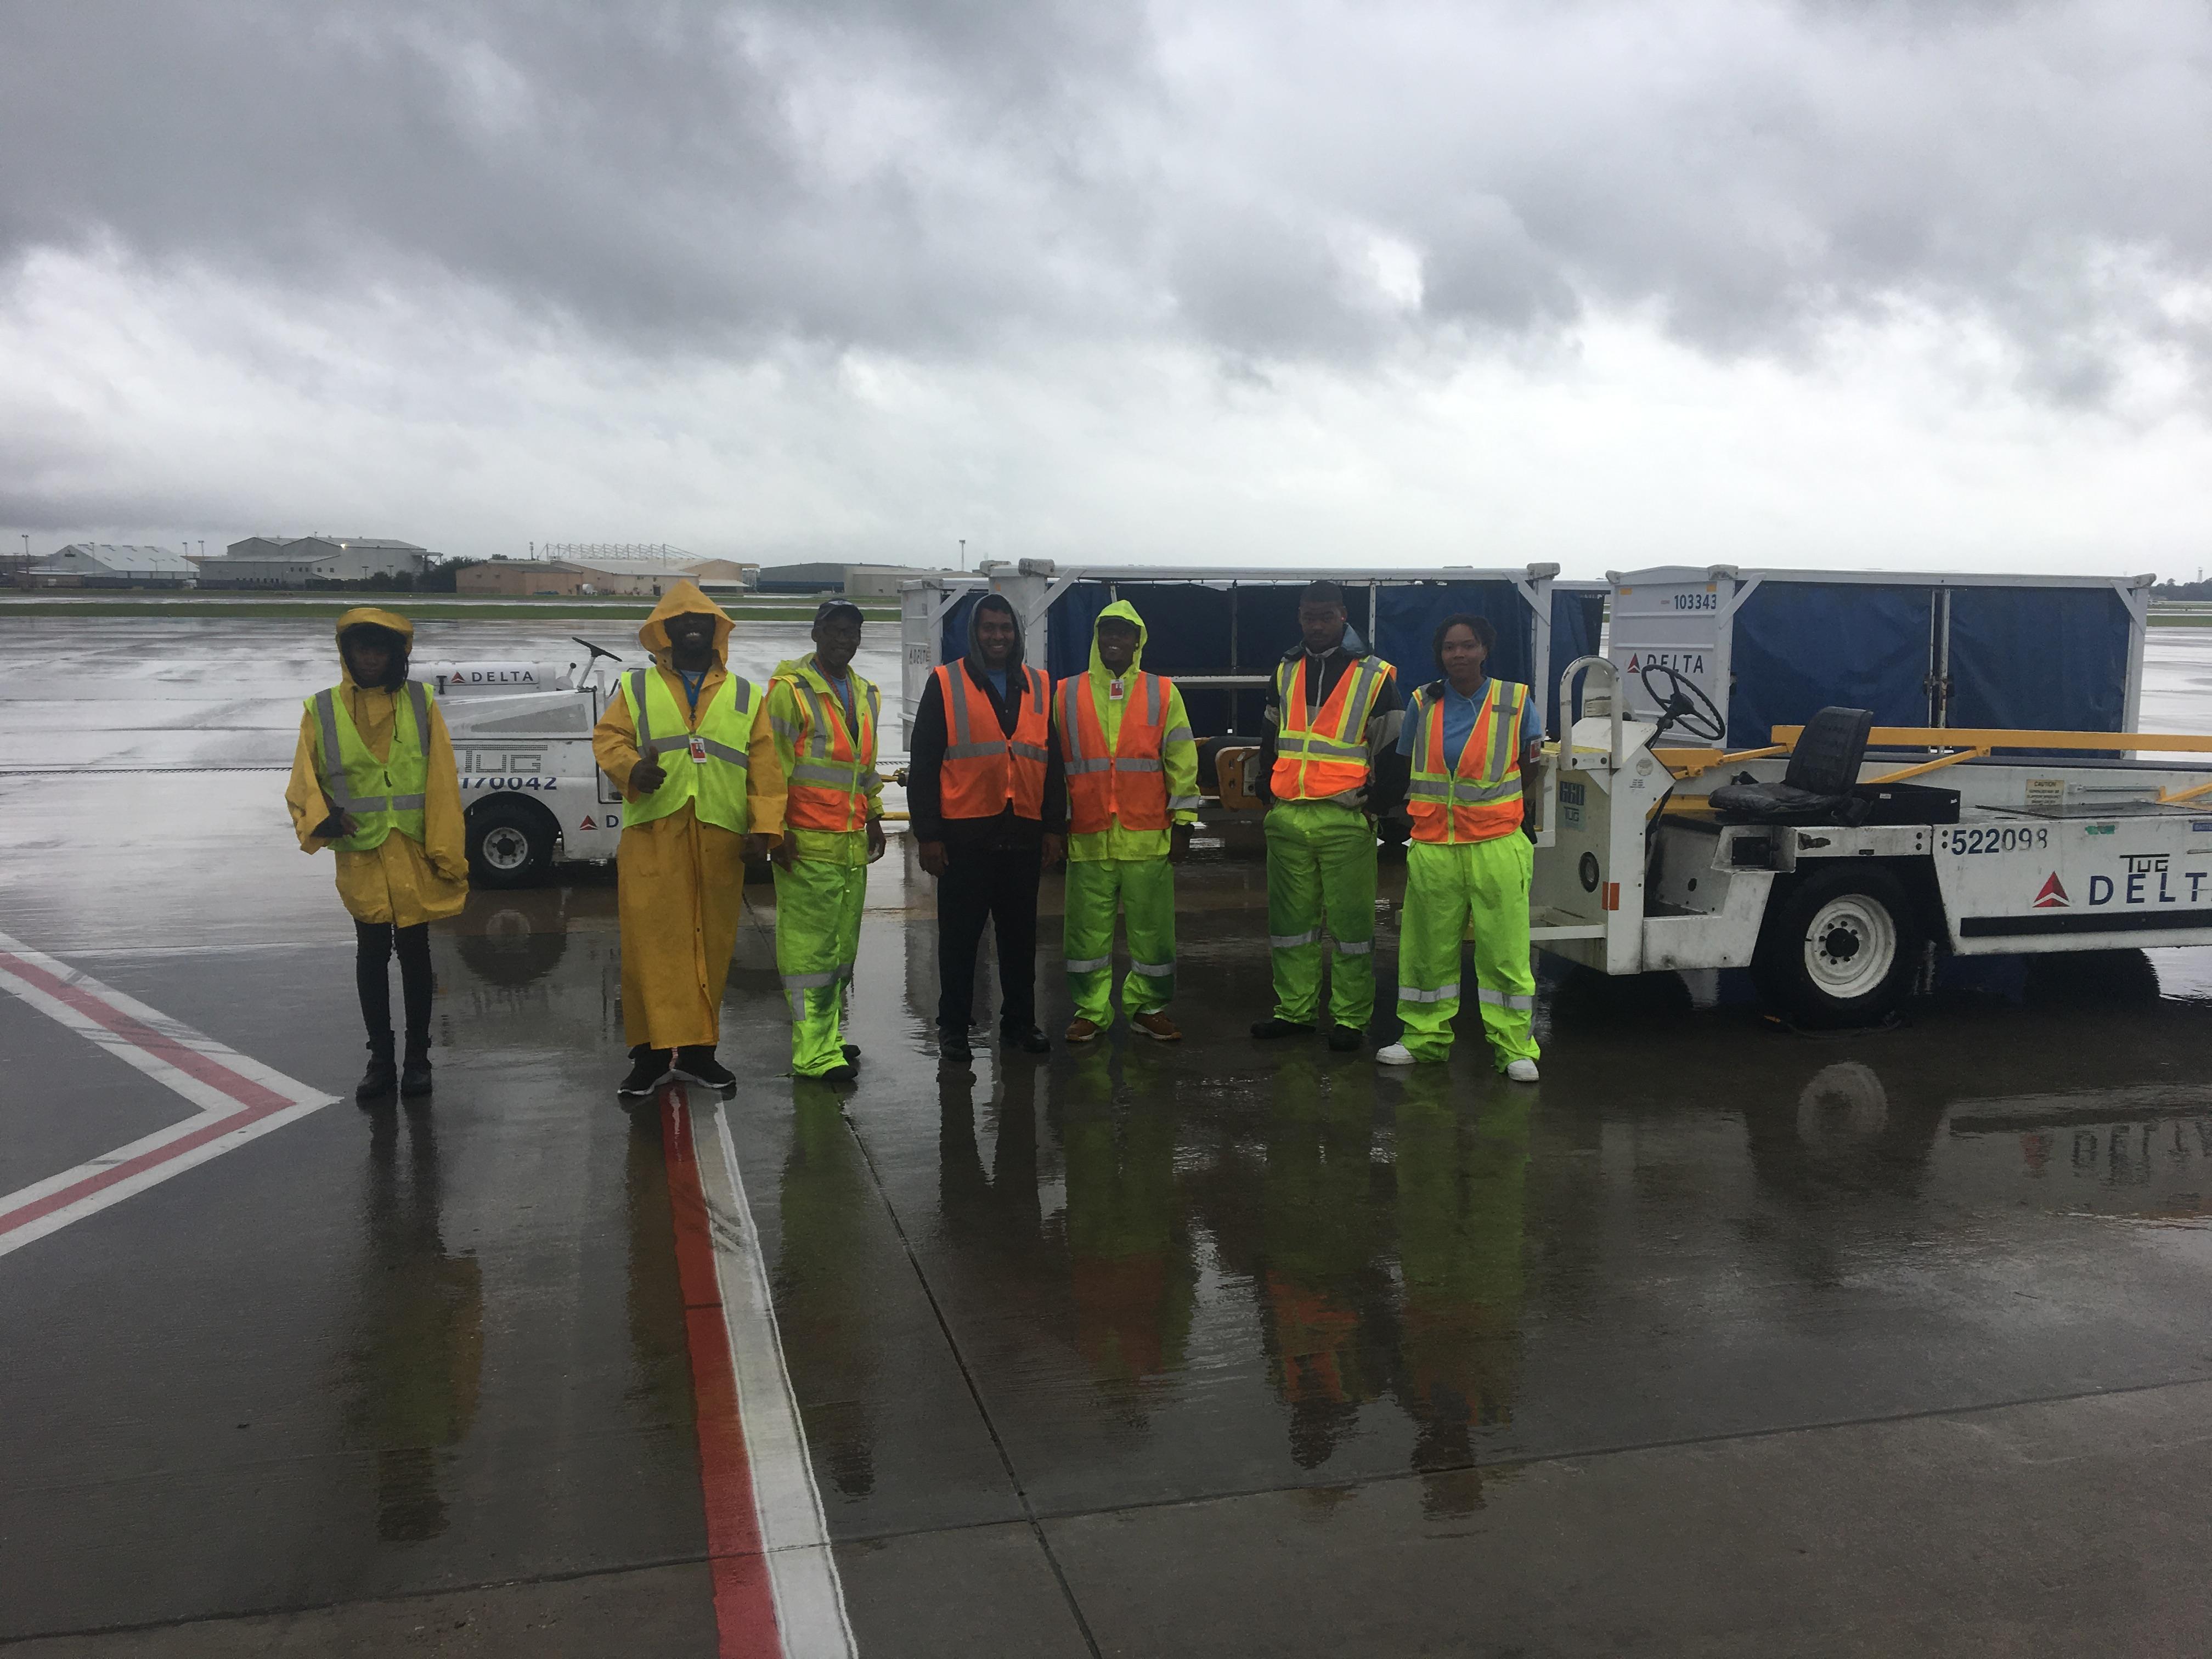 Employees on ramp donning rain gear